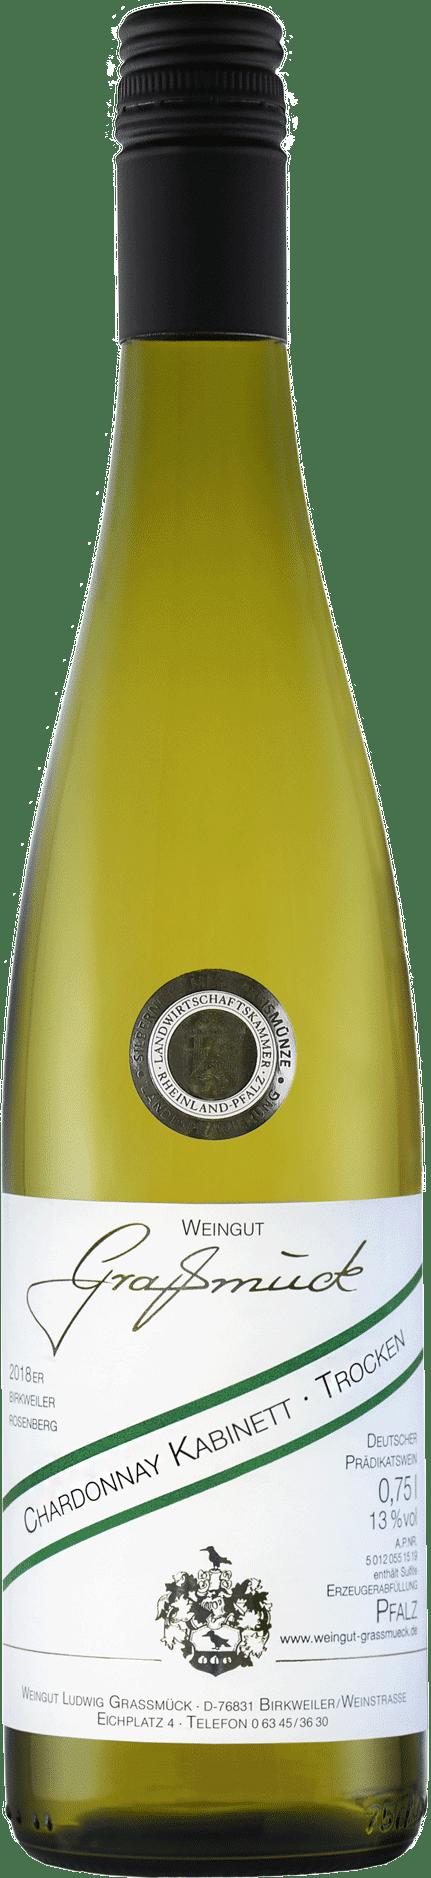 Weingut Ludwig Graßmück, Simon Graßmück, Chardonnay Kabinett, trocken 2018